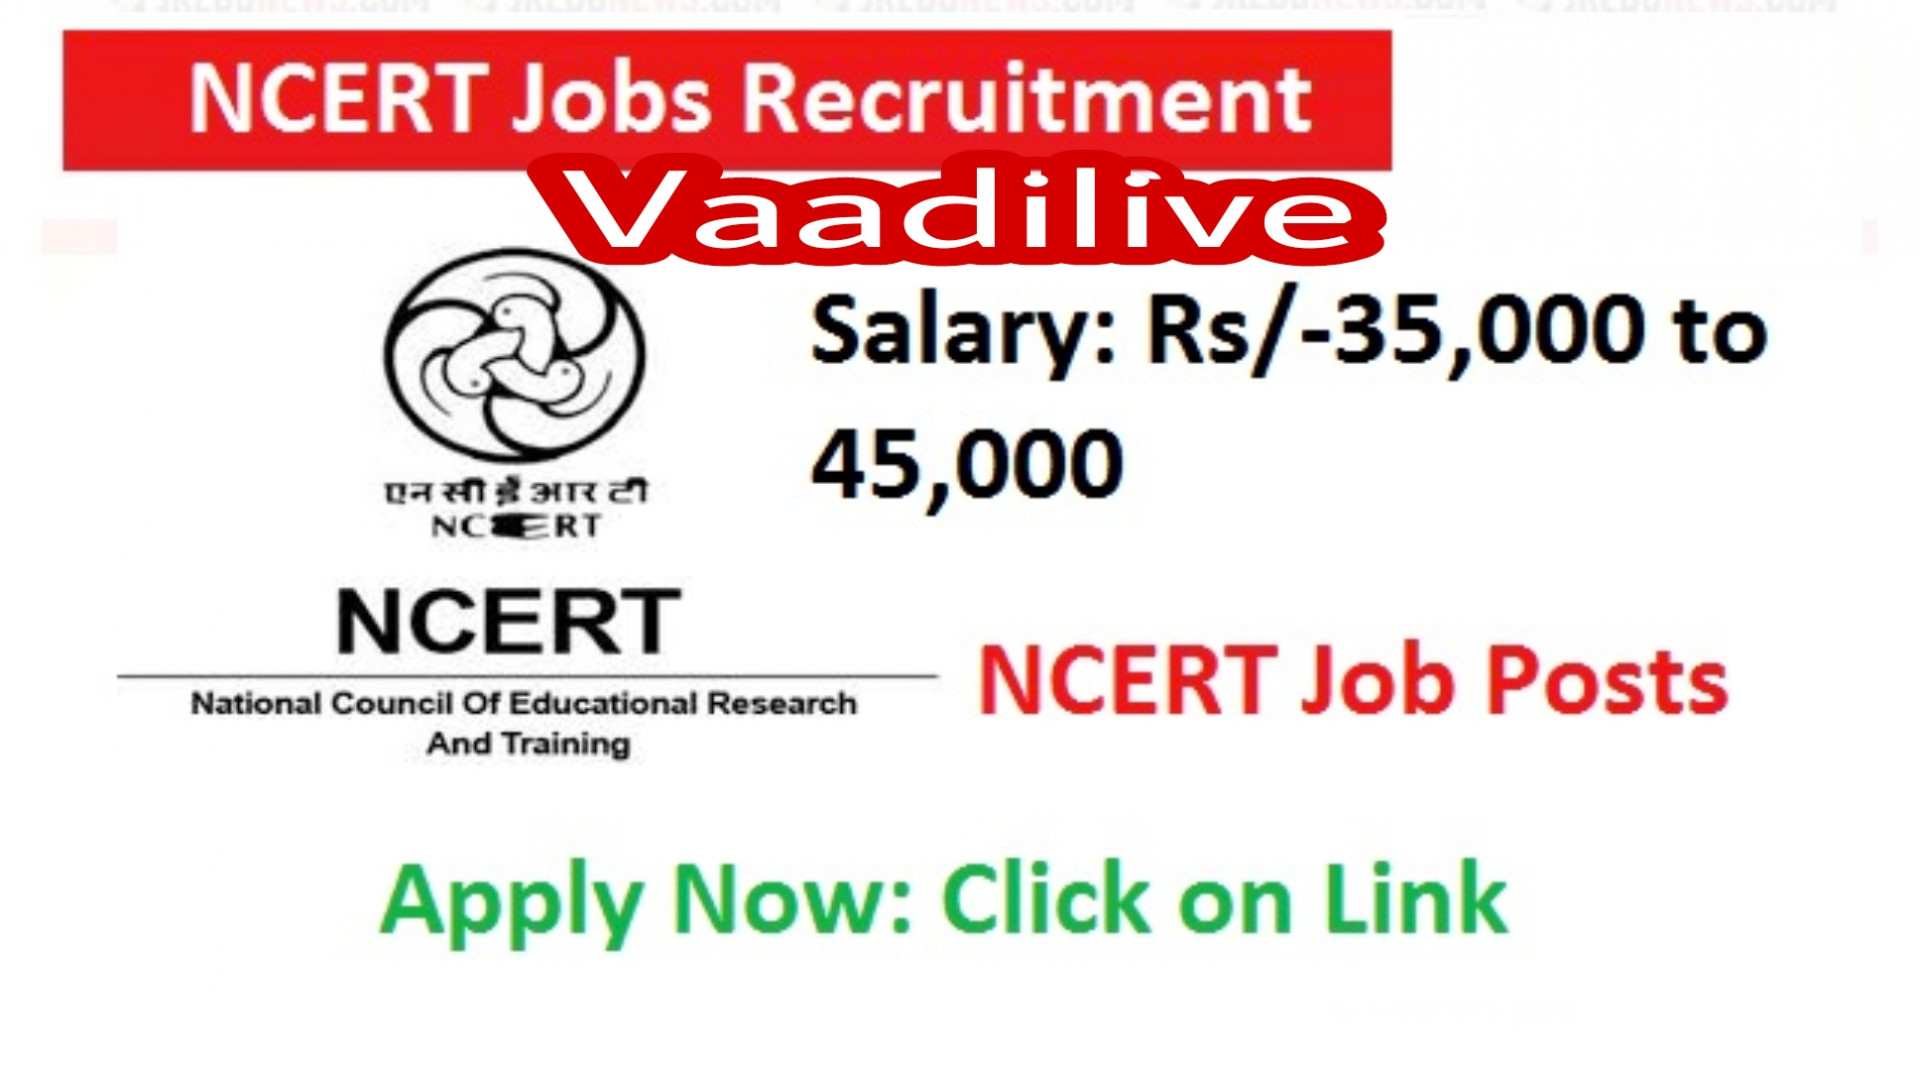 NCERT Jobs 2020 | 33 Vacancies | Latest Job Recruitment Notification